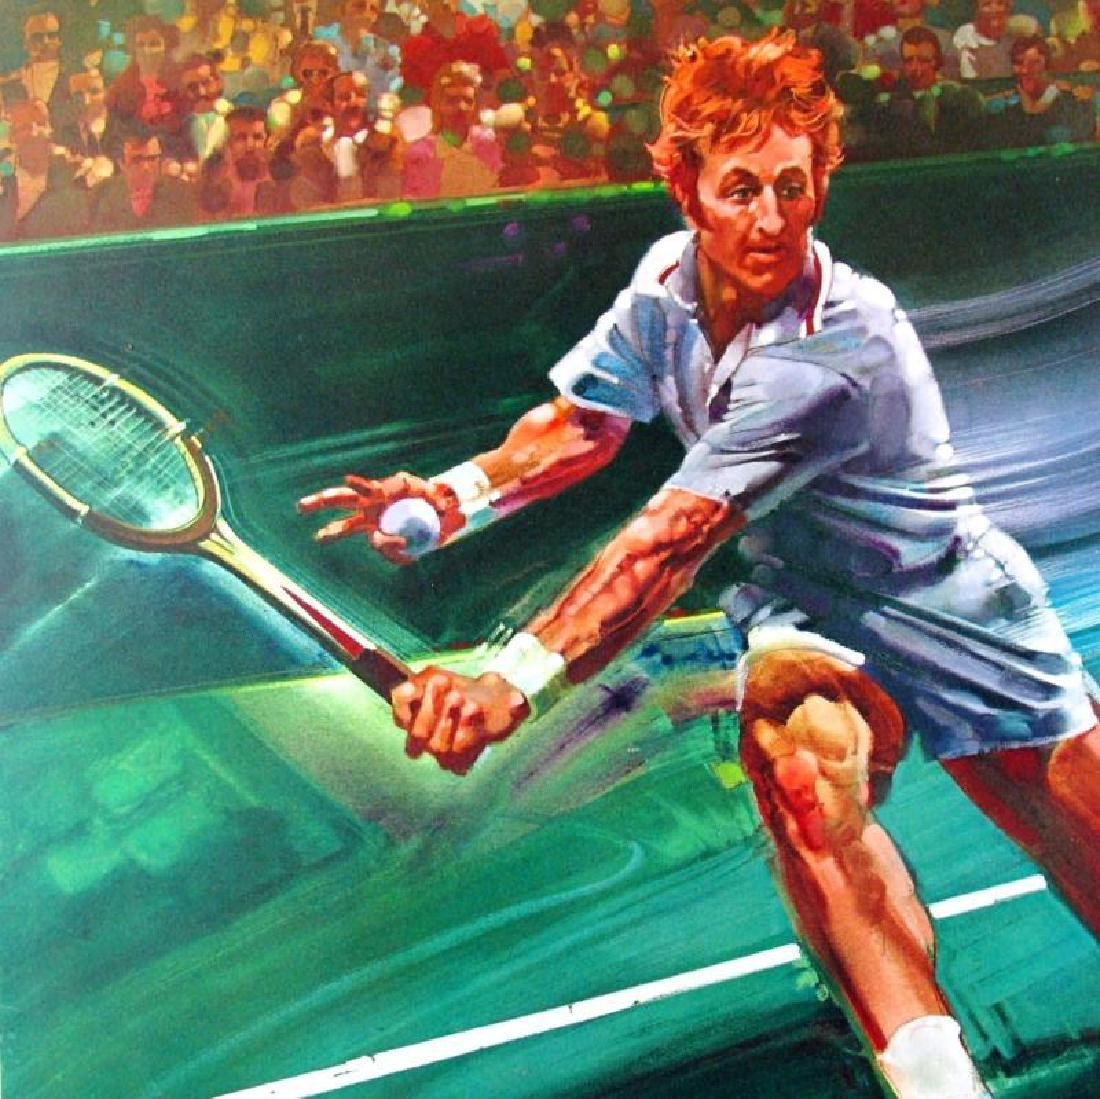 Tennis Star Rod Laver Neiman-Style Ltd Ed Signed - 2